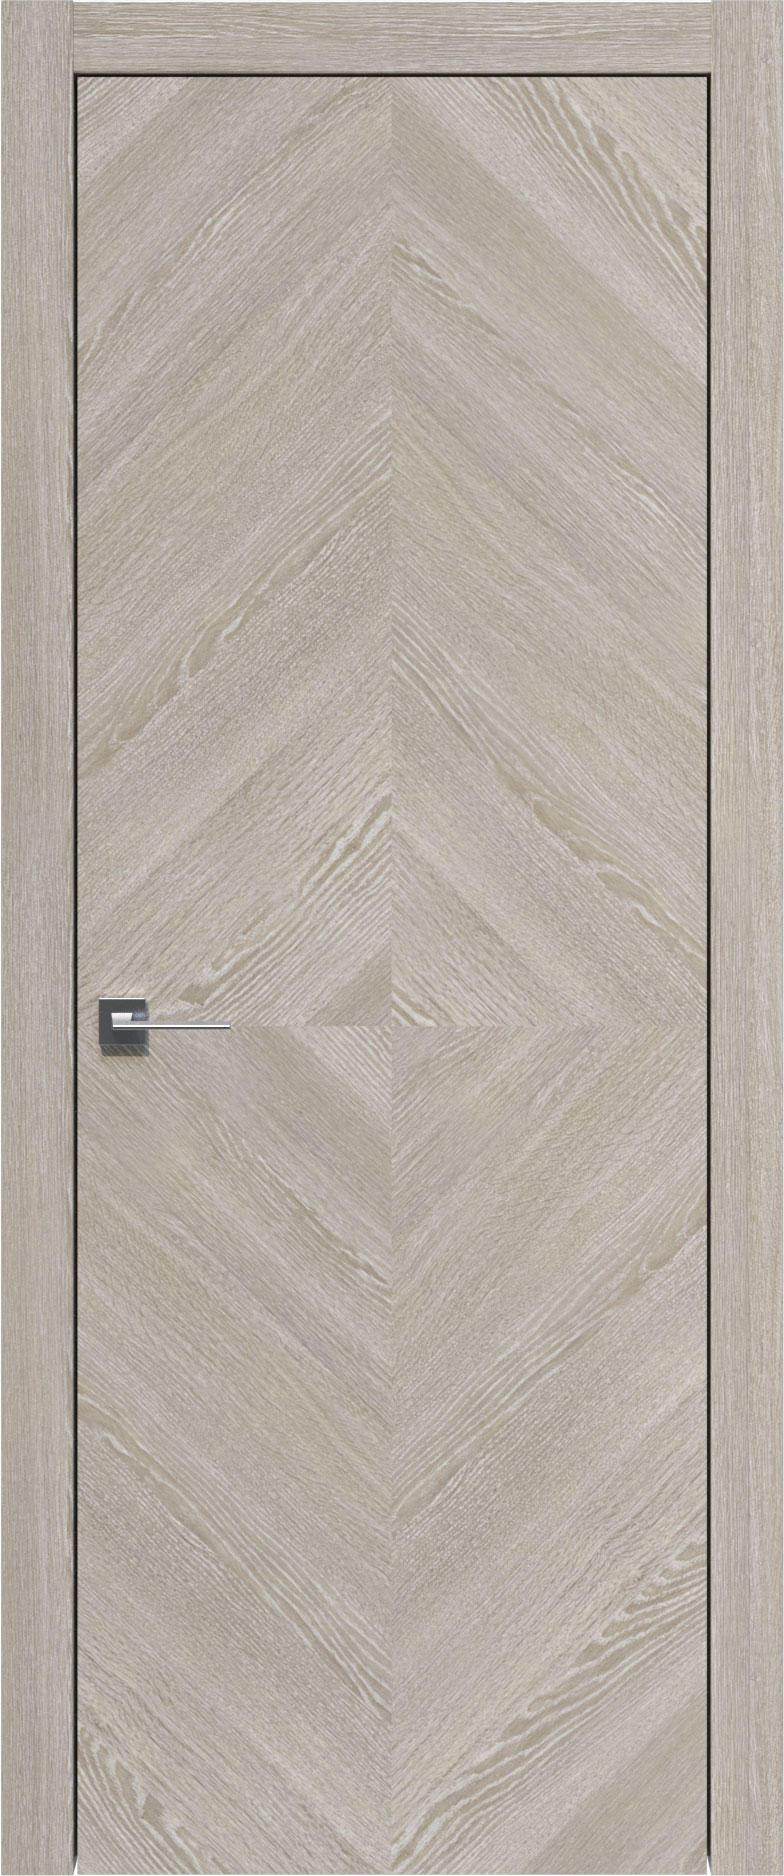 Tivoli К-1 цвет - Серый дуб Без стекла (ДГ)